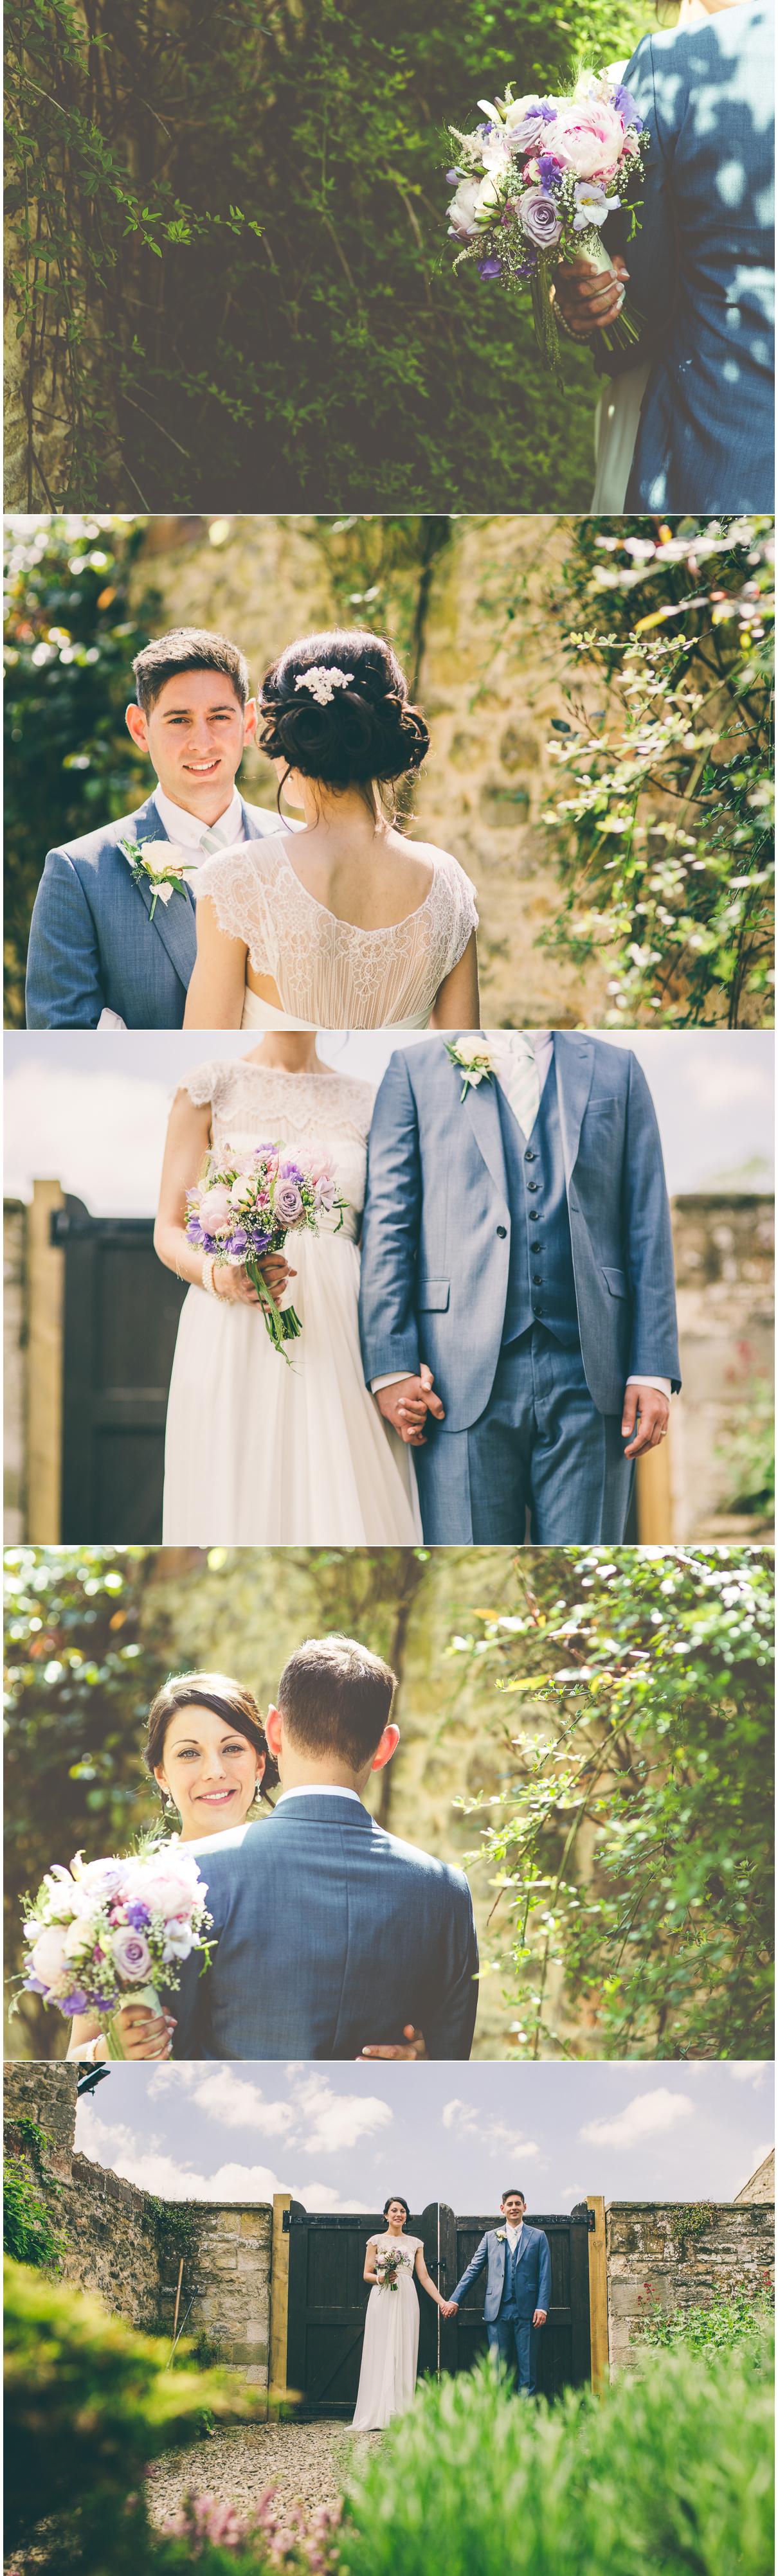 Neil_Jackson_Photographic_Scarborough_York_Yorkshire_Wedding_Photographer_Julie_Jon_Black_Swan_Helmsley_Wedding_Shoot_Blog10